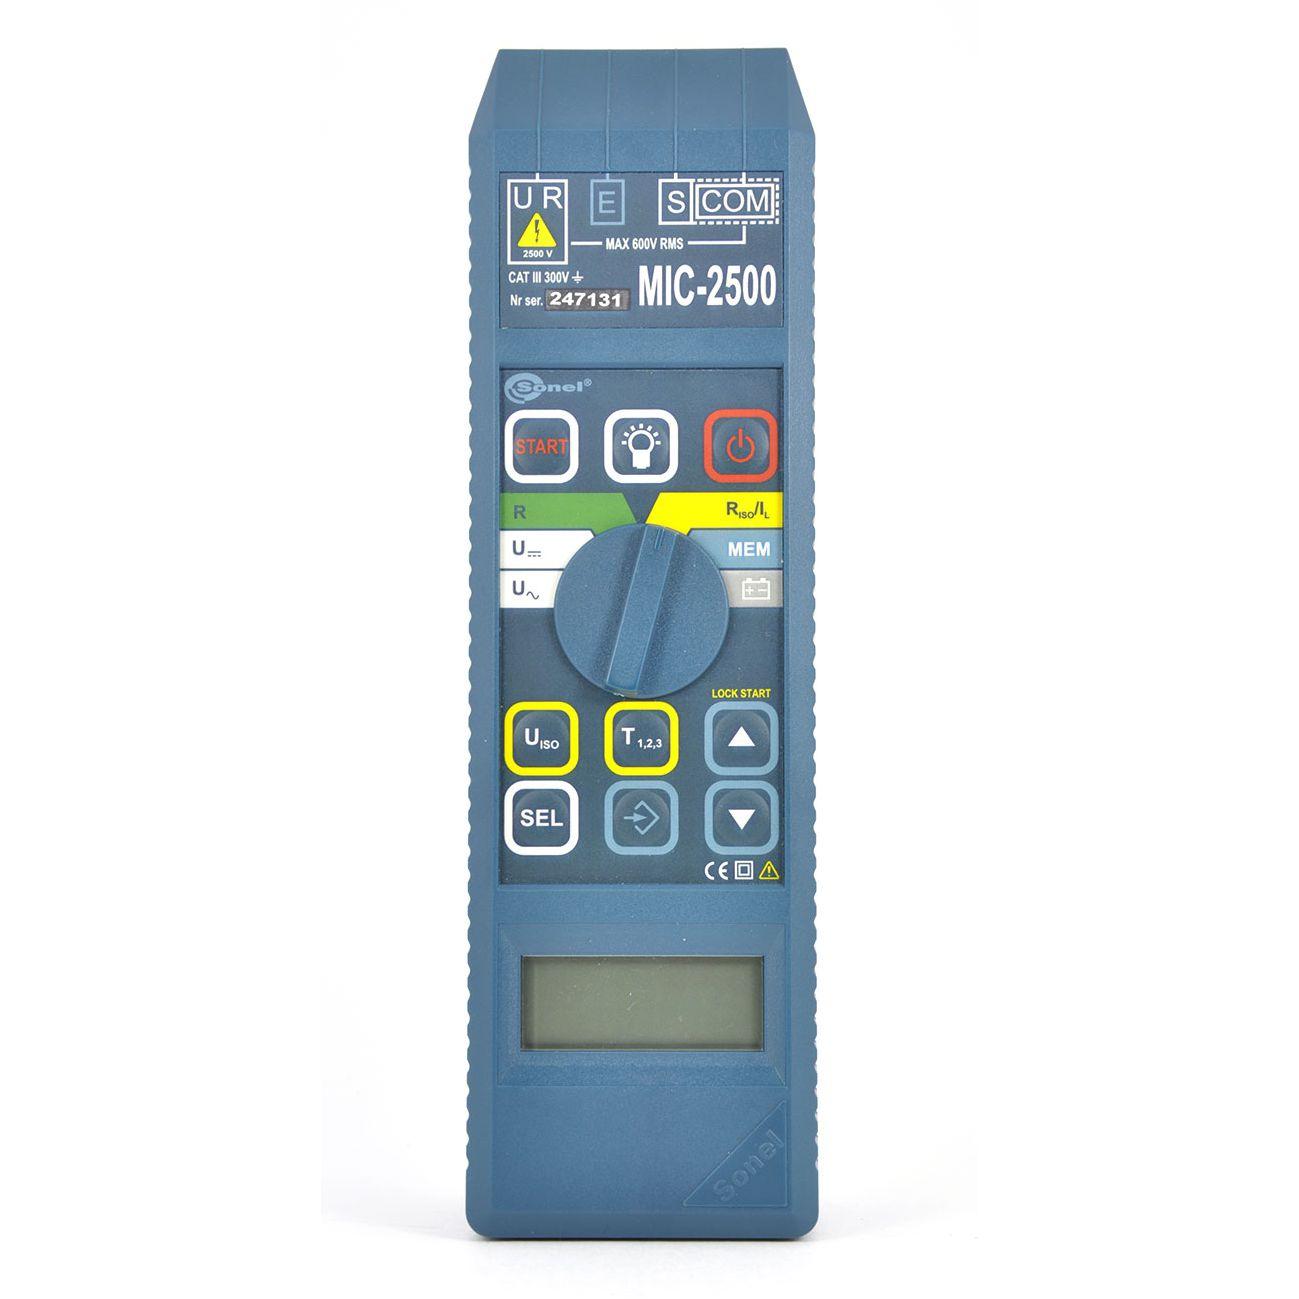 MIC-2500